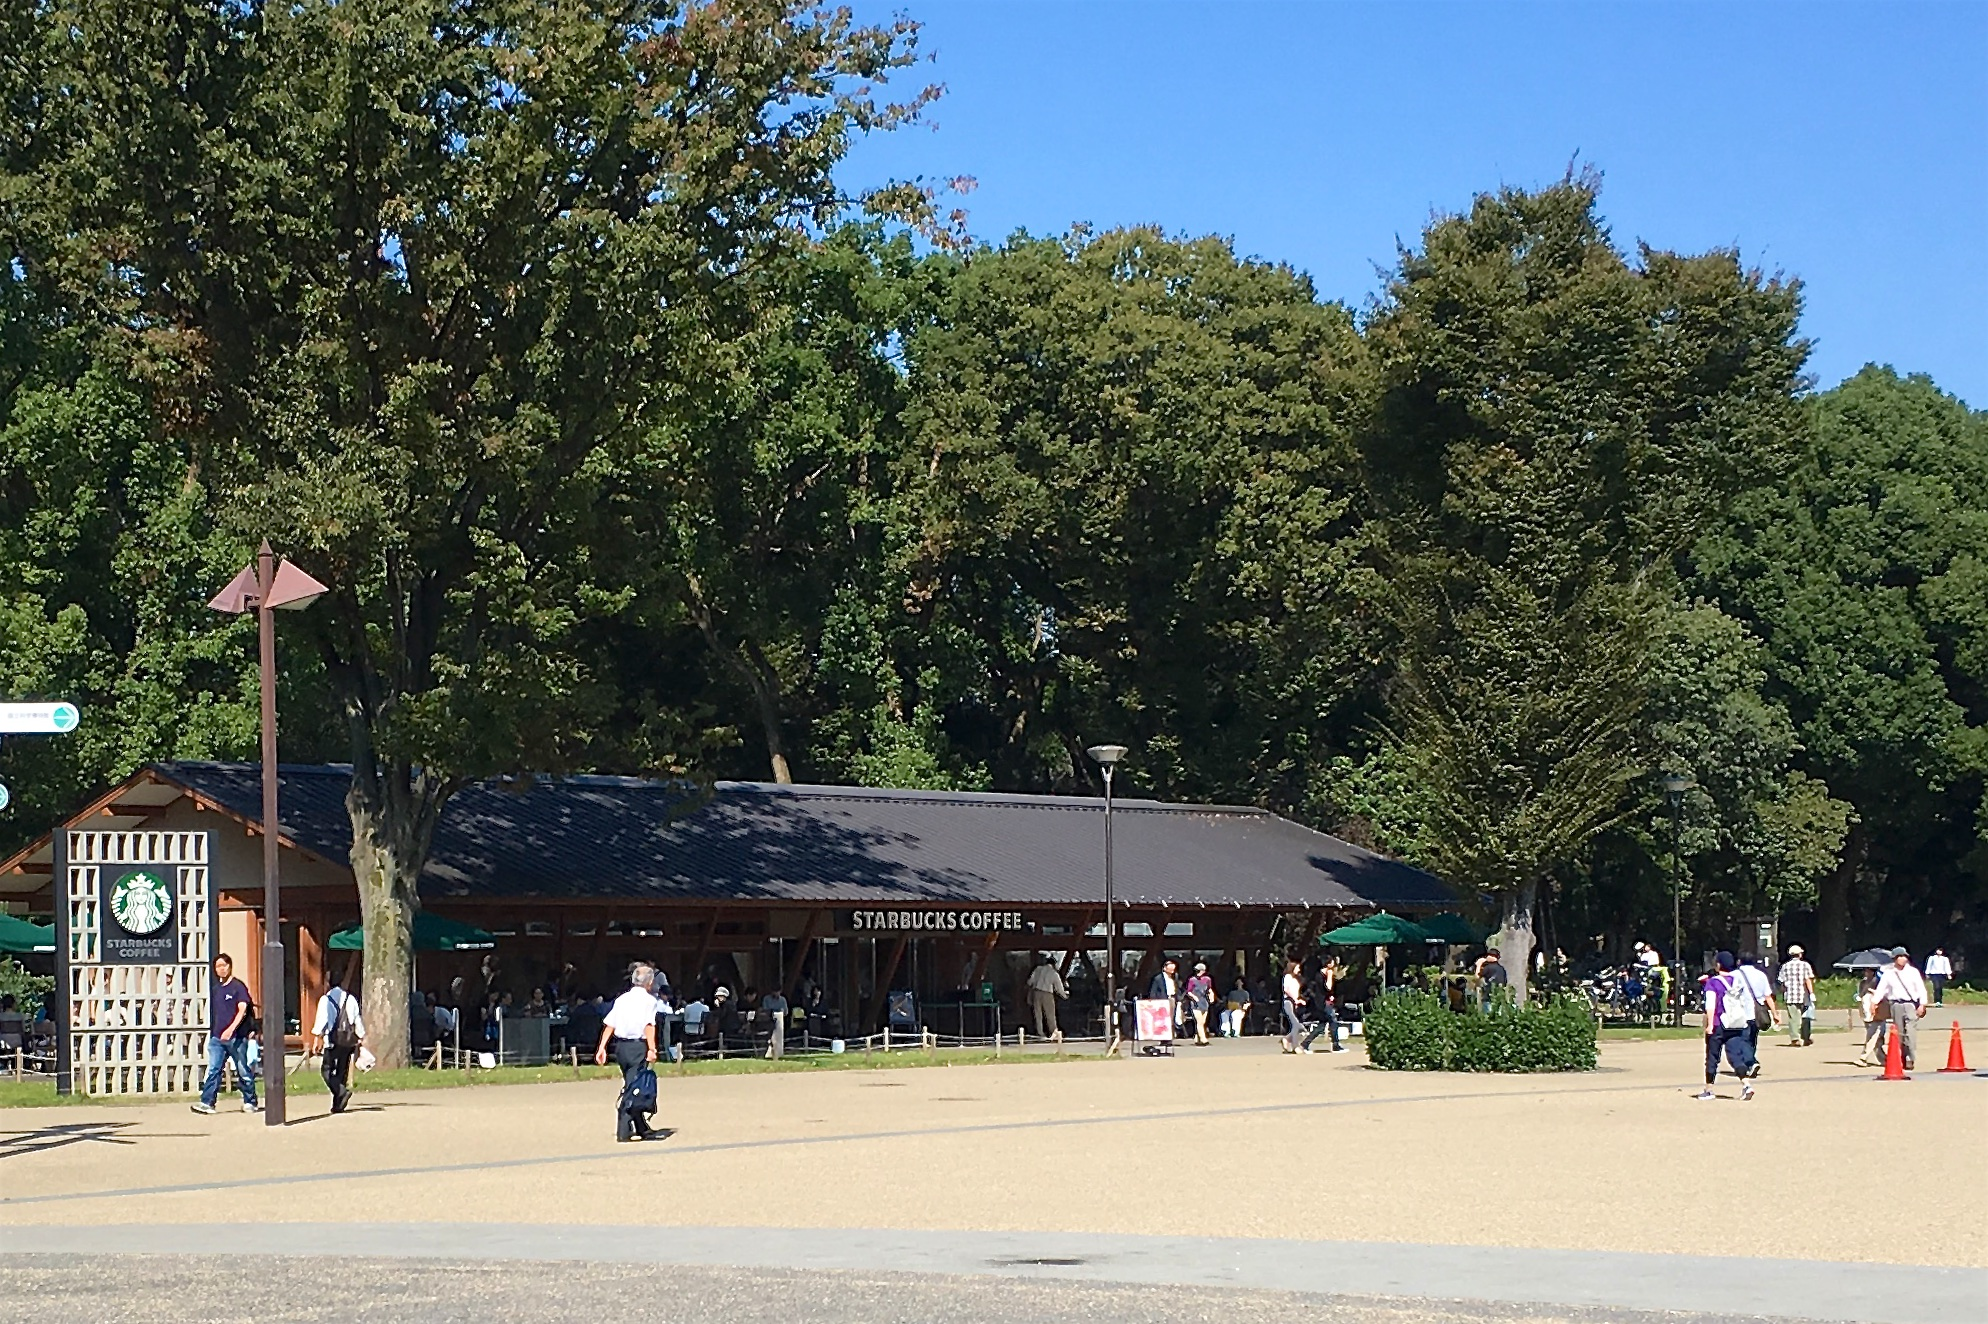 Starbucks in the park